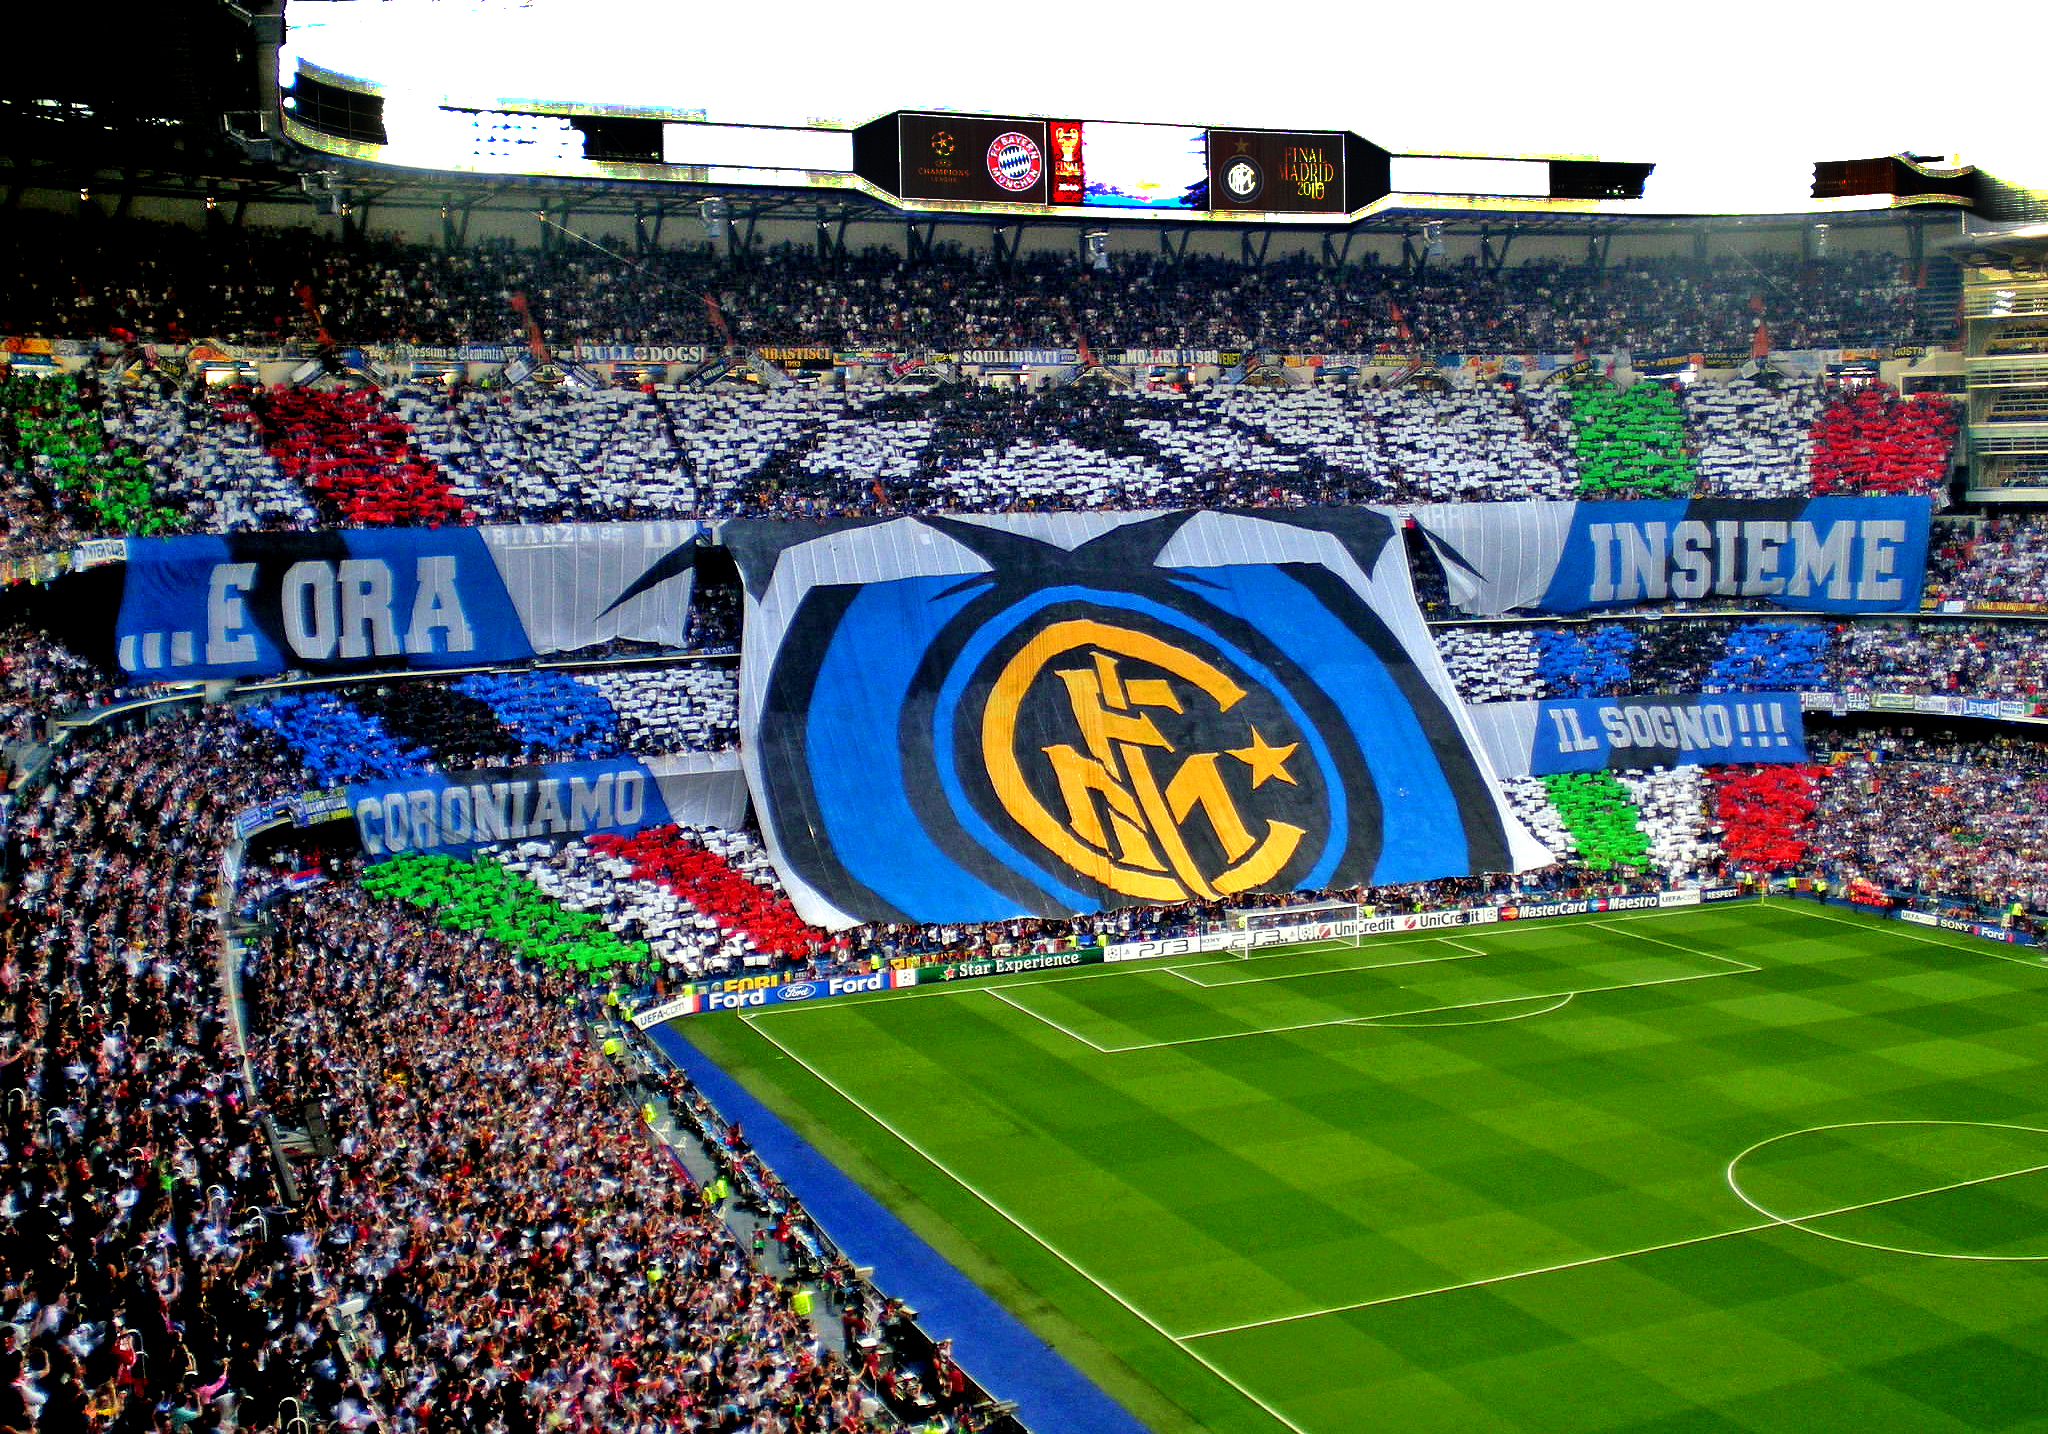 Il_biscione_e_l'fc_Internazionale_al_Bernabeu